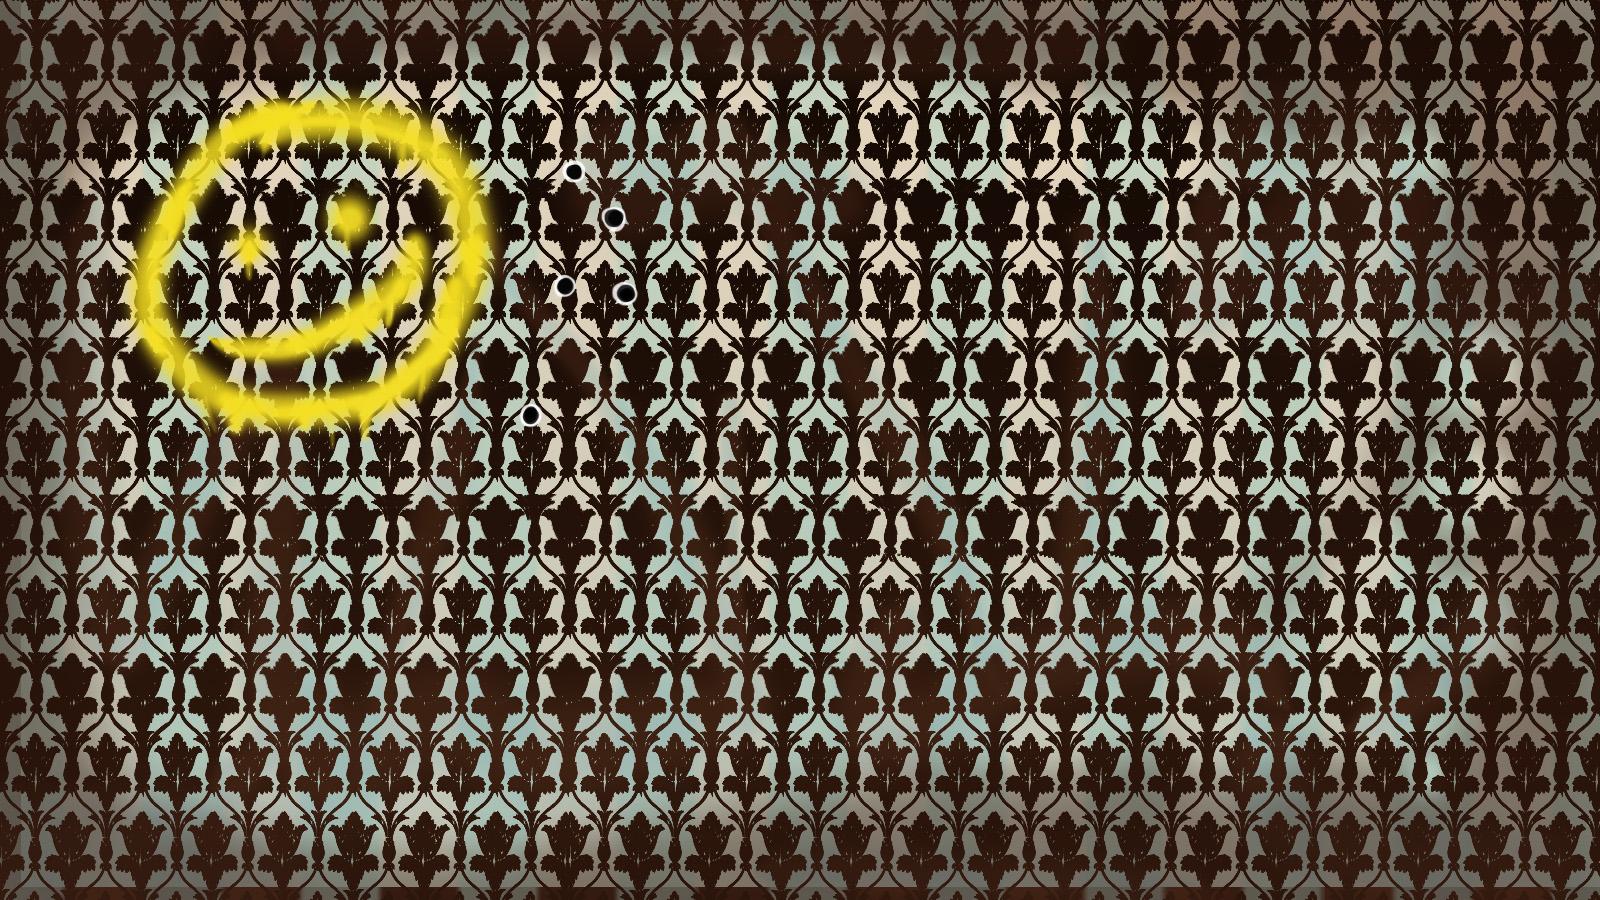 wallpapers sherlock holmes bbc - photo #31